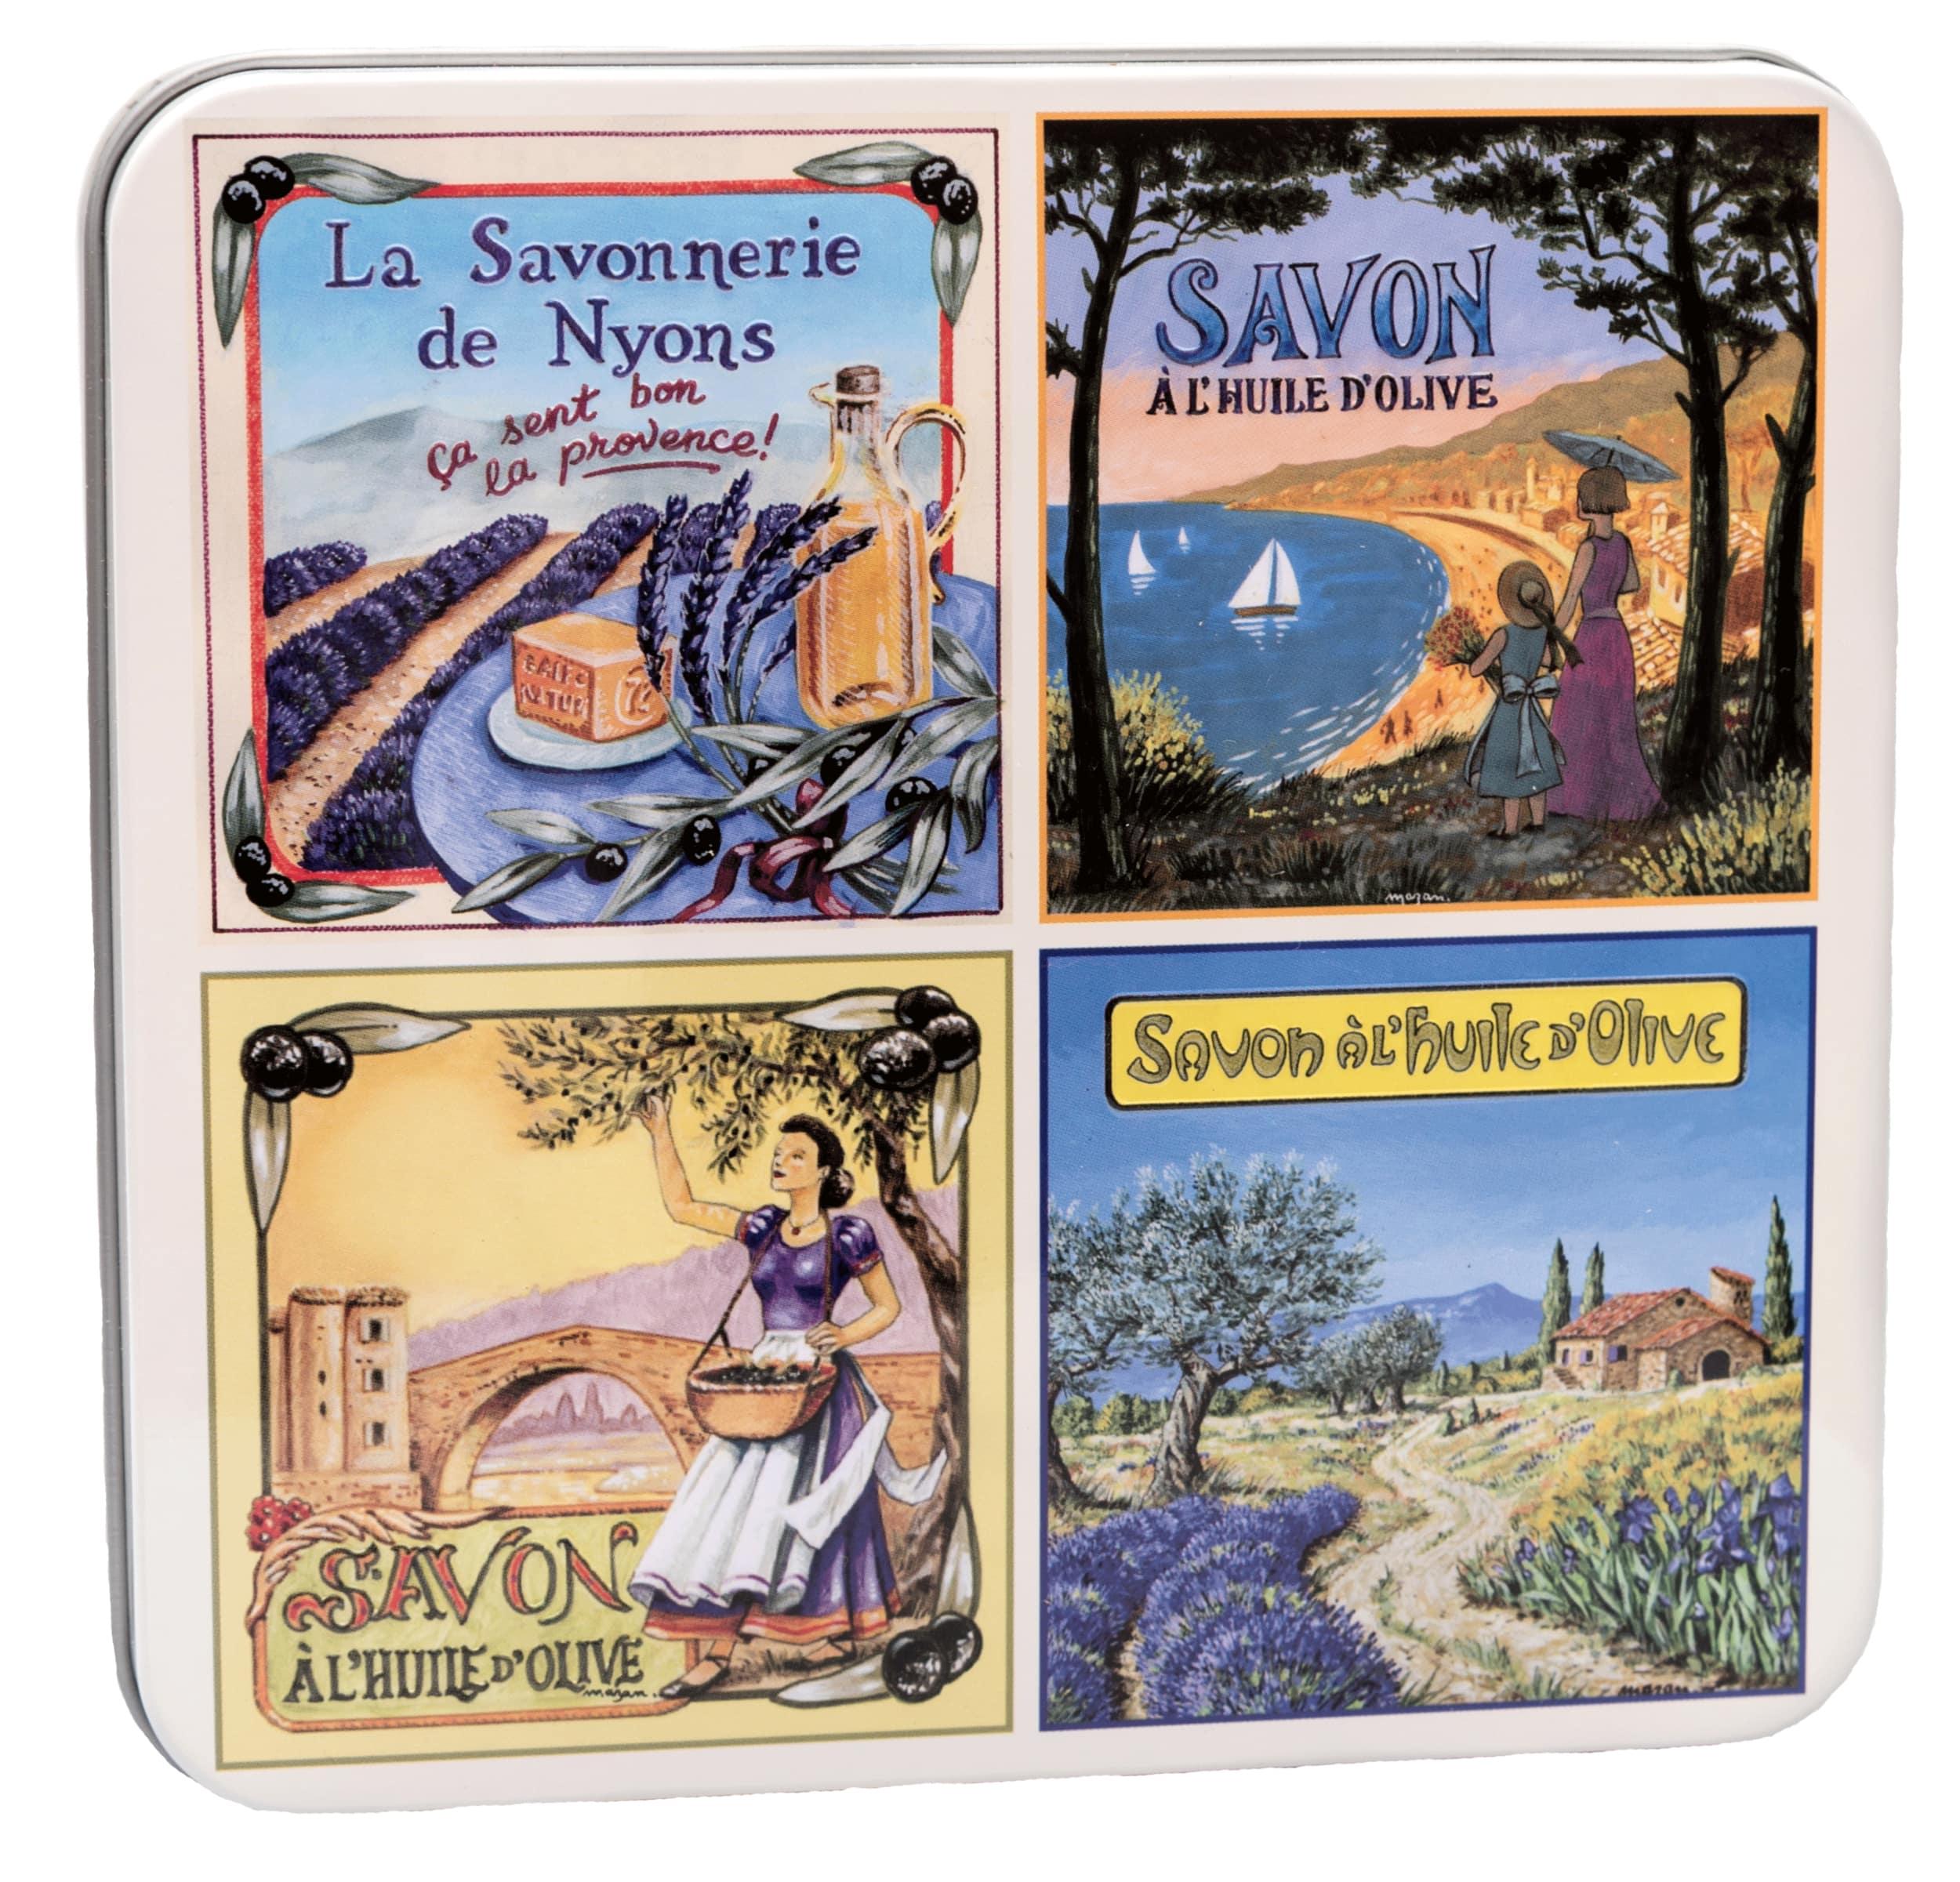 Metallbox 4x 100g - Vue de Provence